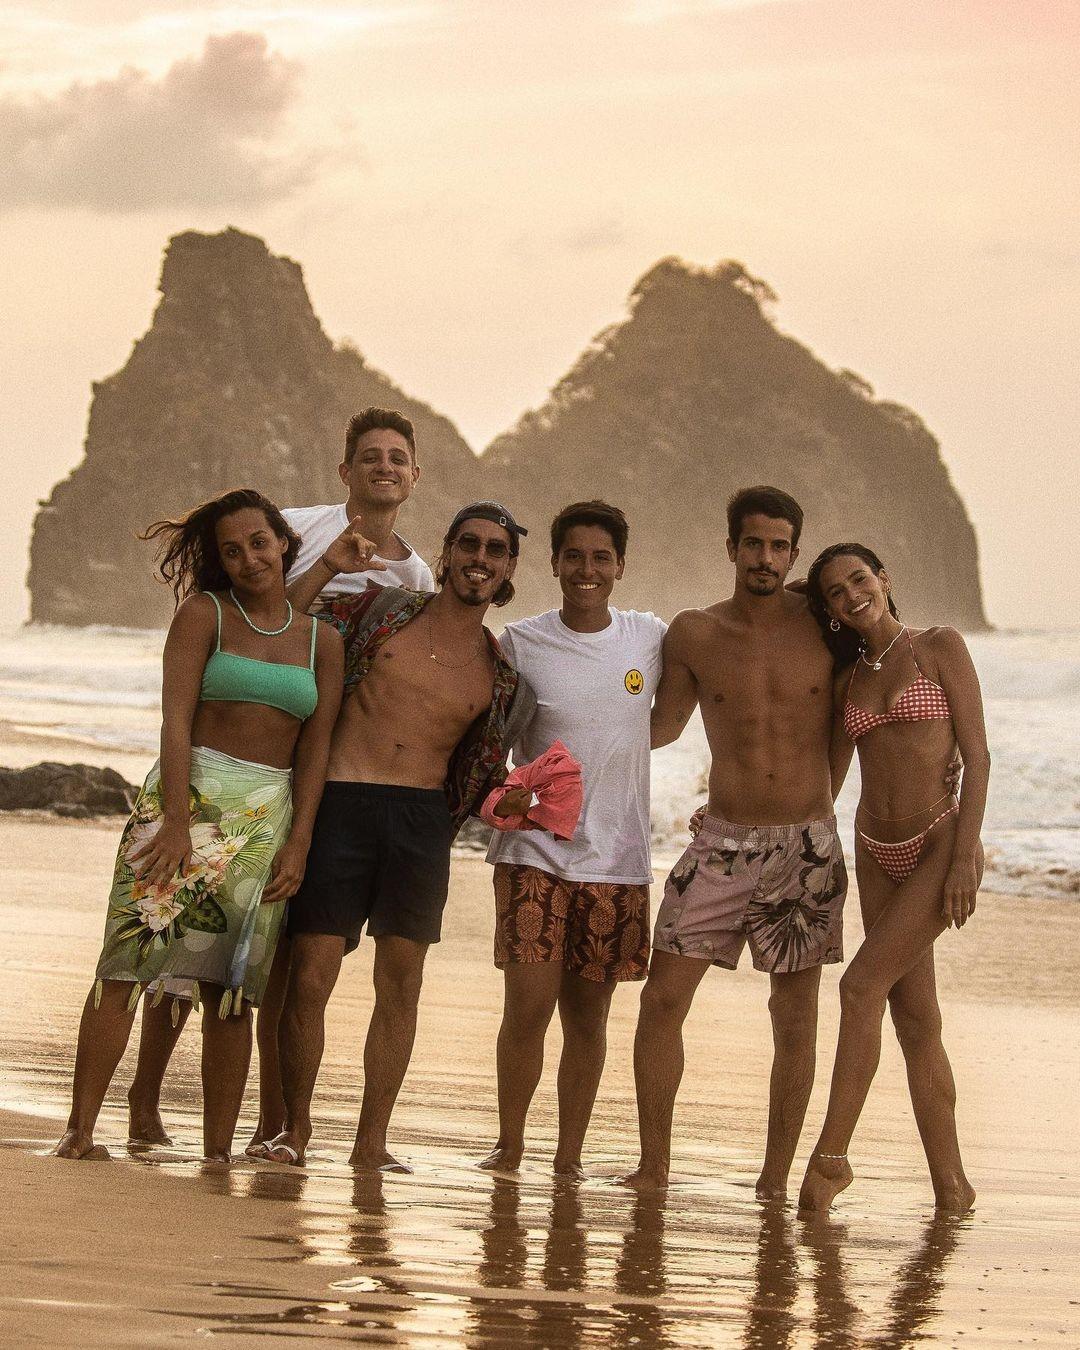 Grupo viajou juntos para Noronha